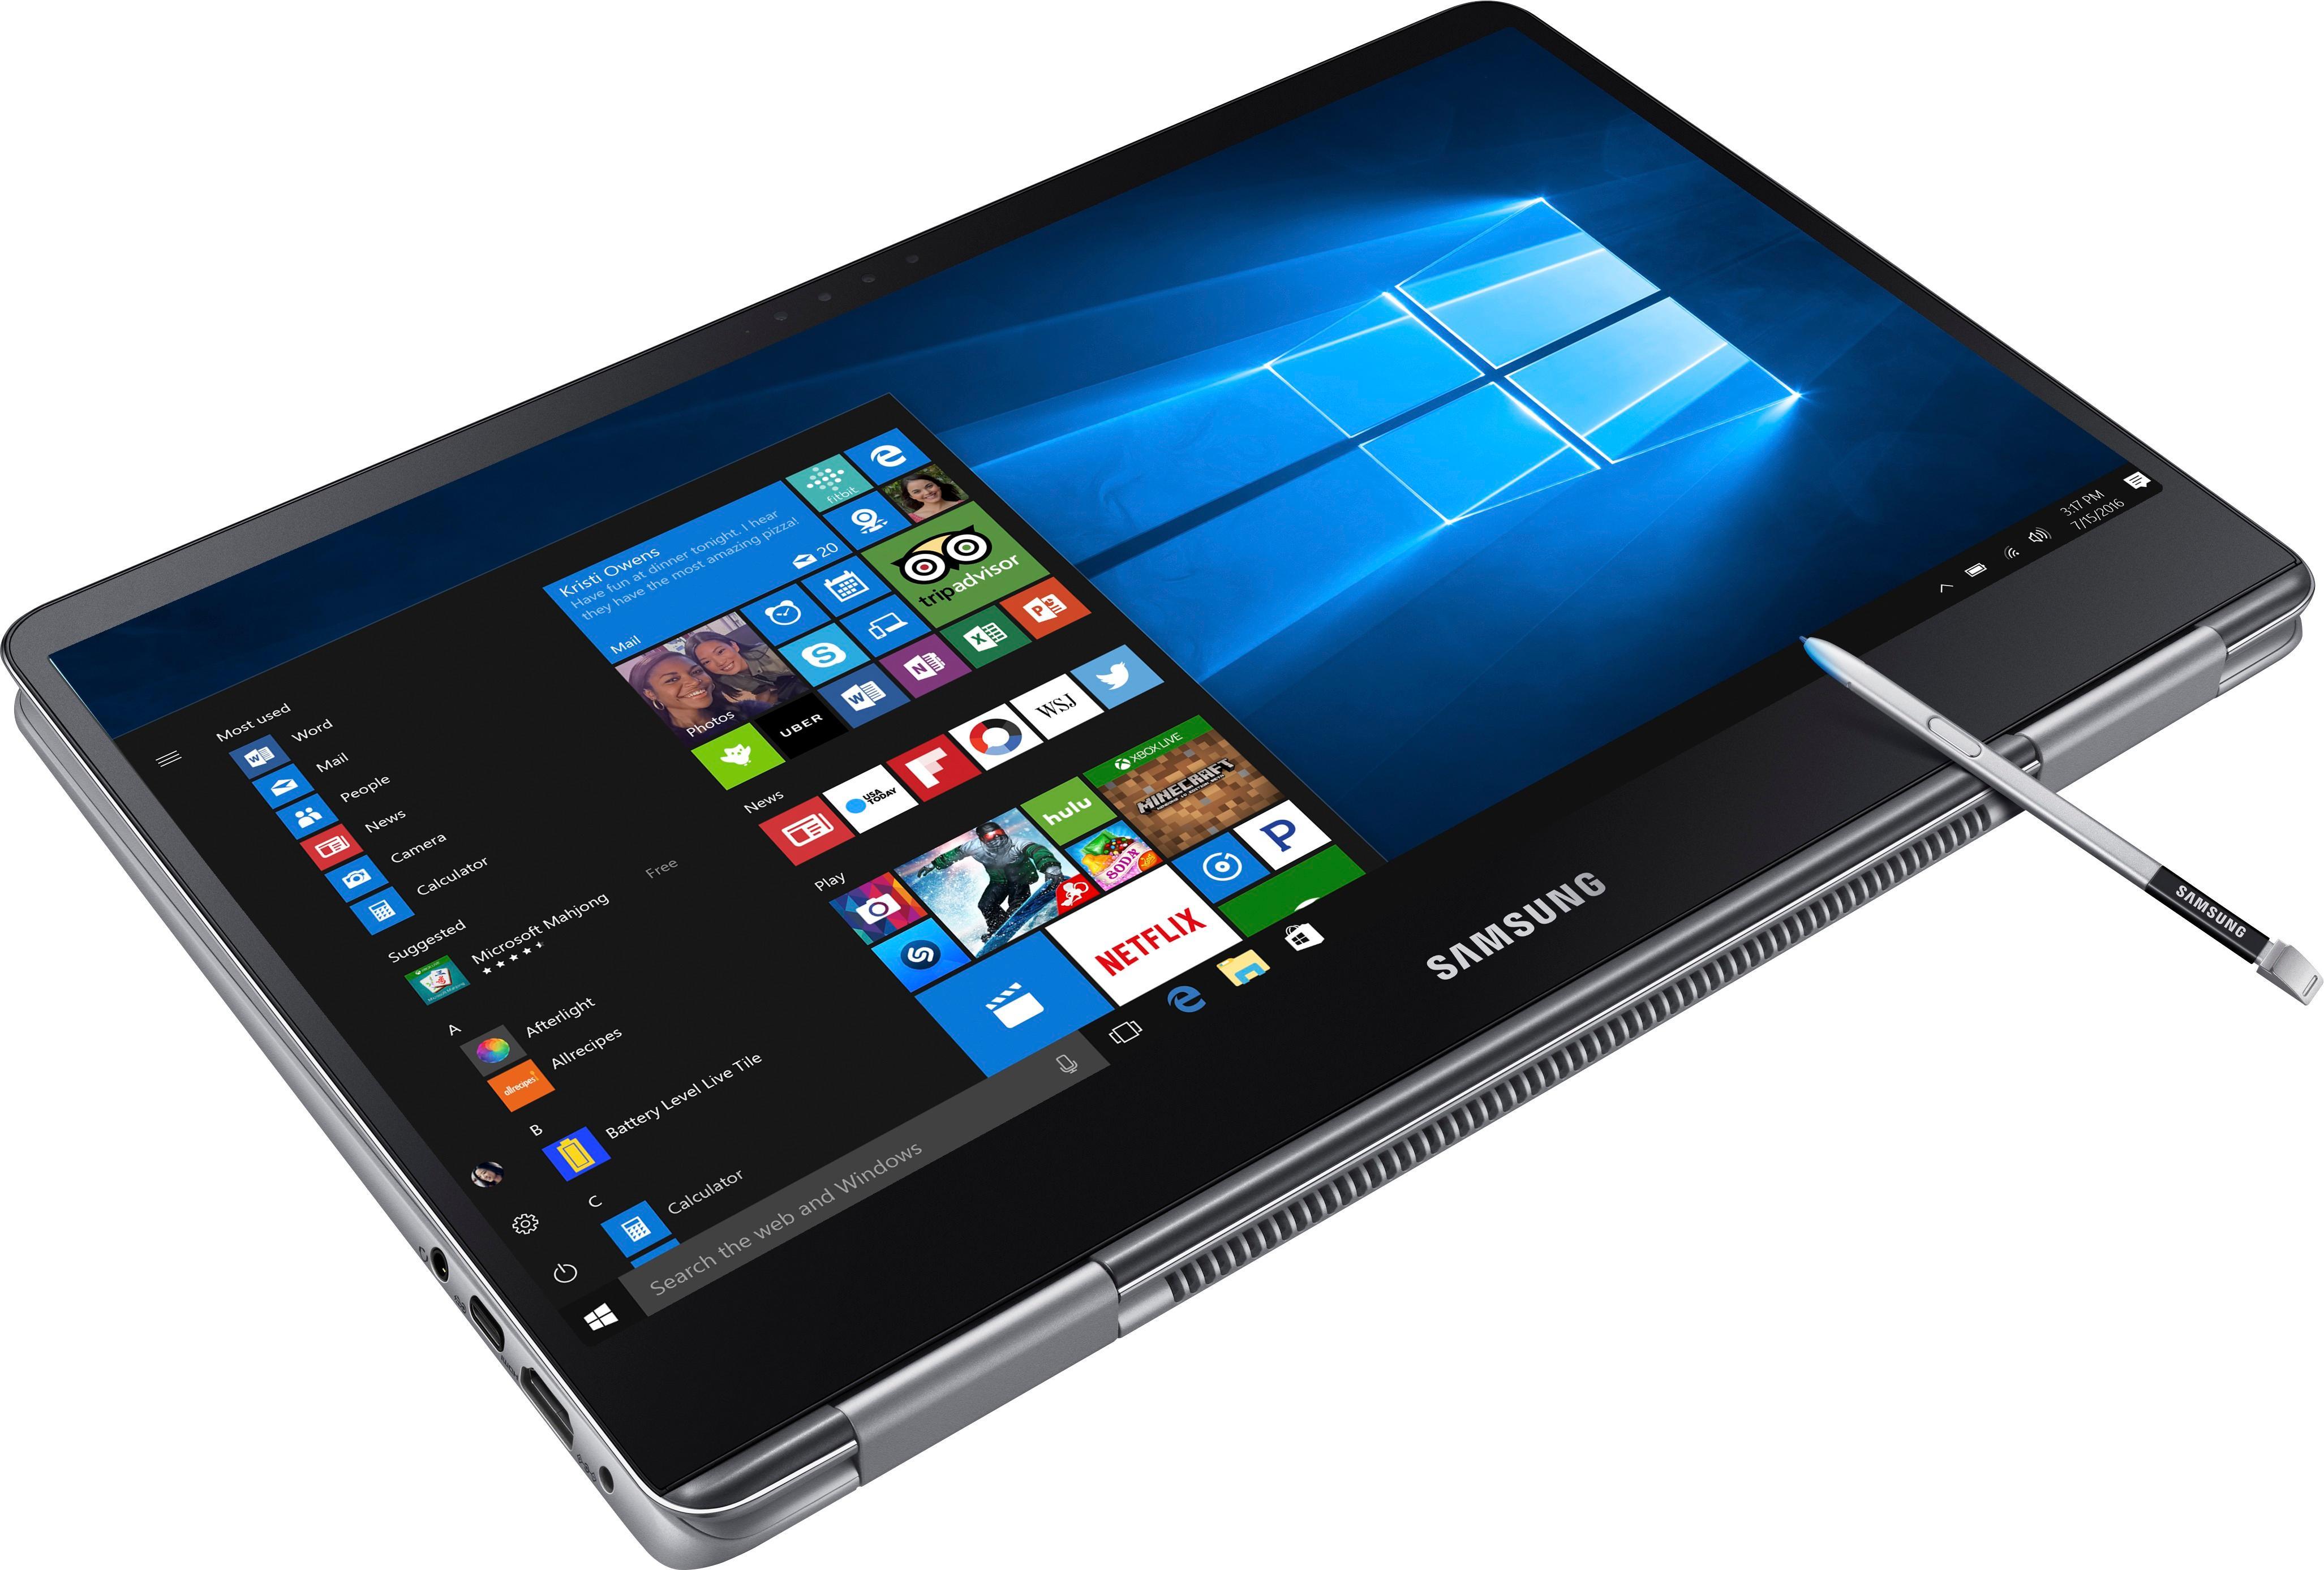 Samsung Notebook 9 Pro: 15.6'' FHD IPS Touch, i7-8550U, 16GB Ram, 256GB SSD, Radeon 540 2GB, Win10H @ $900 + F/S